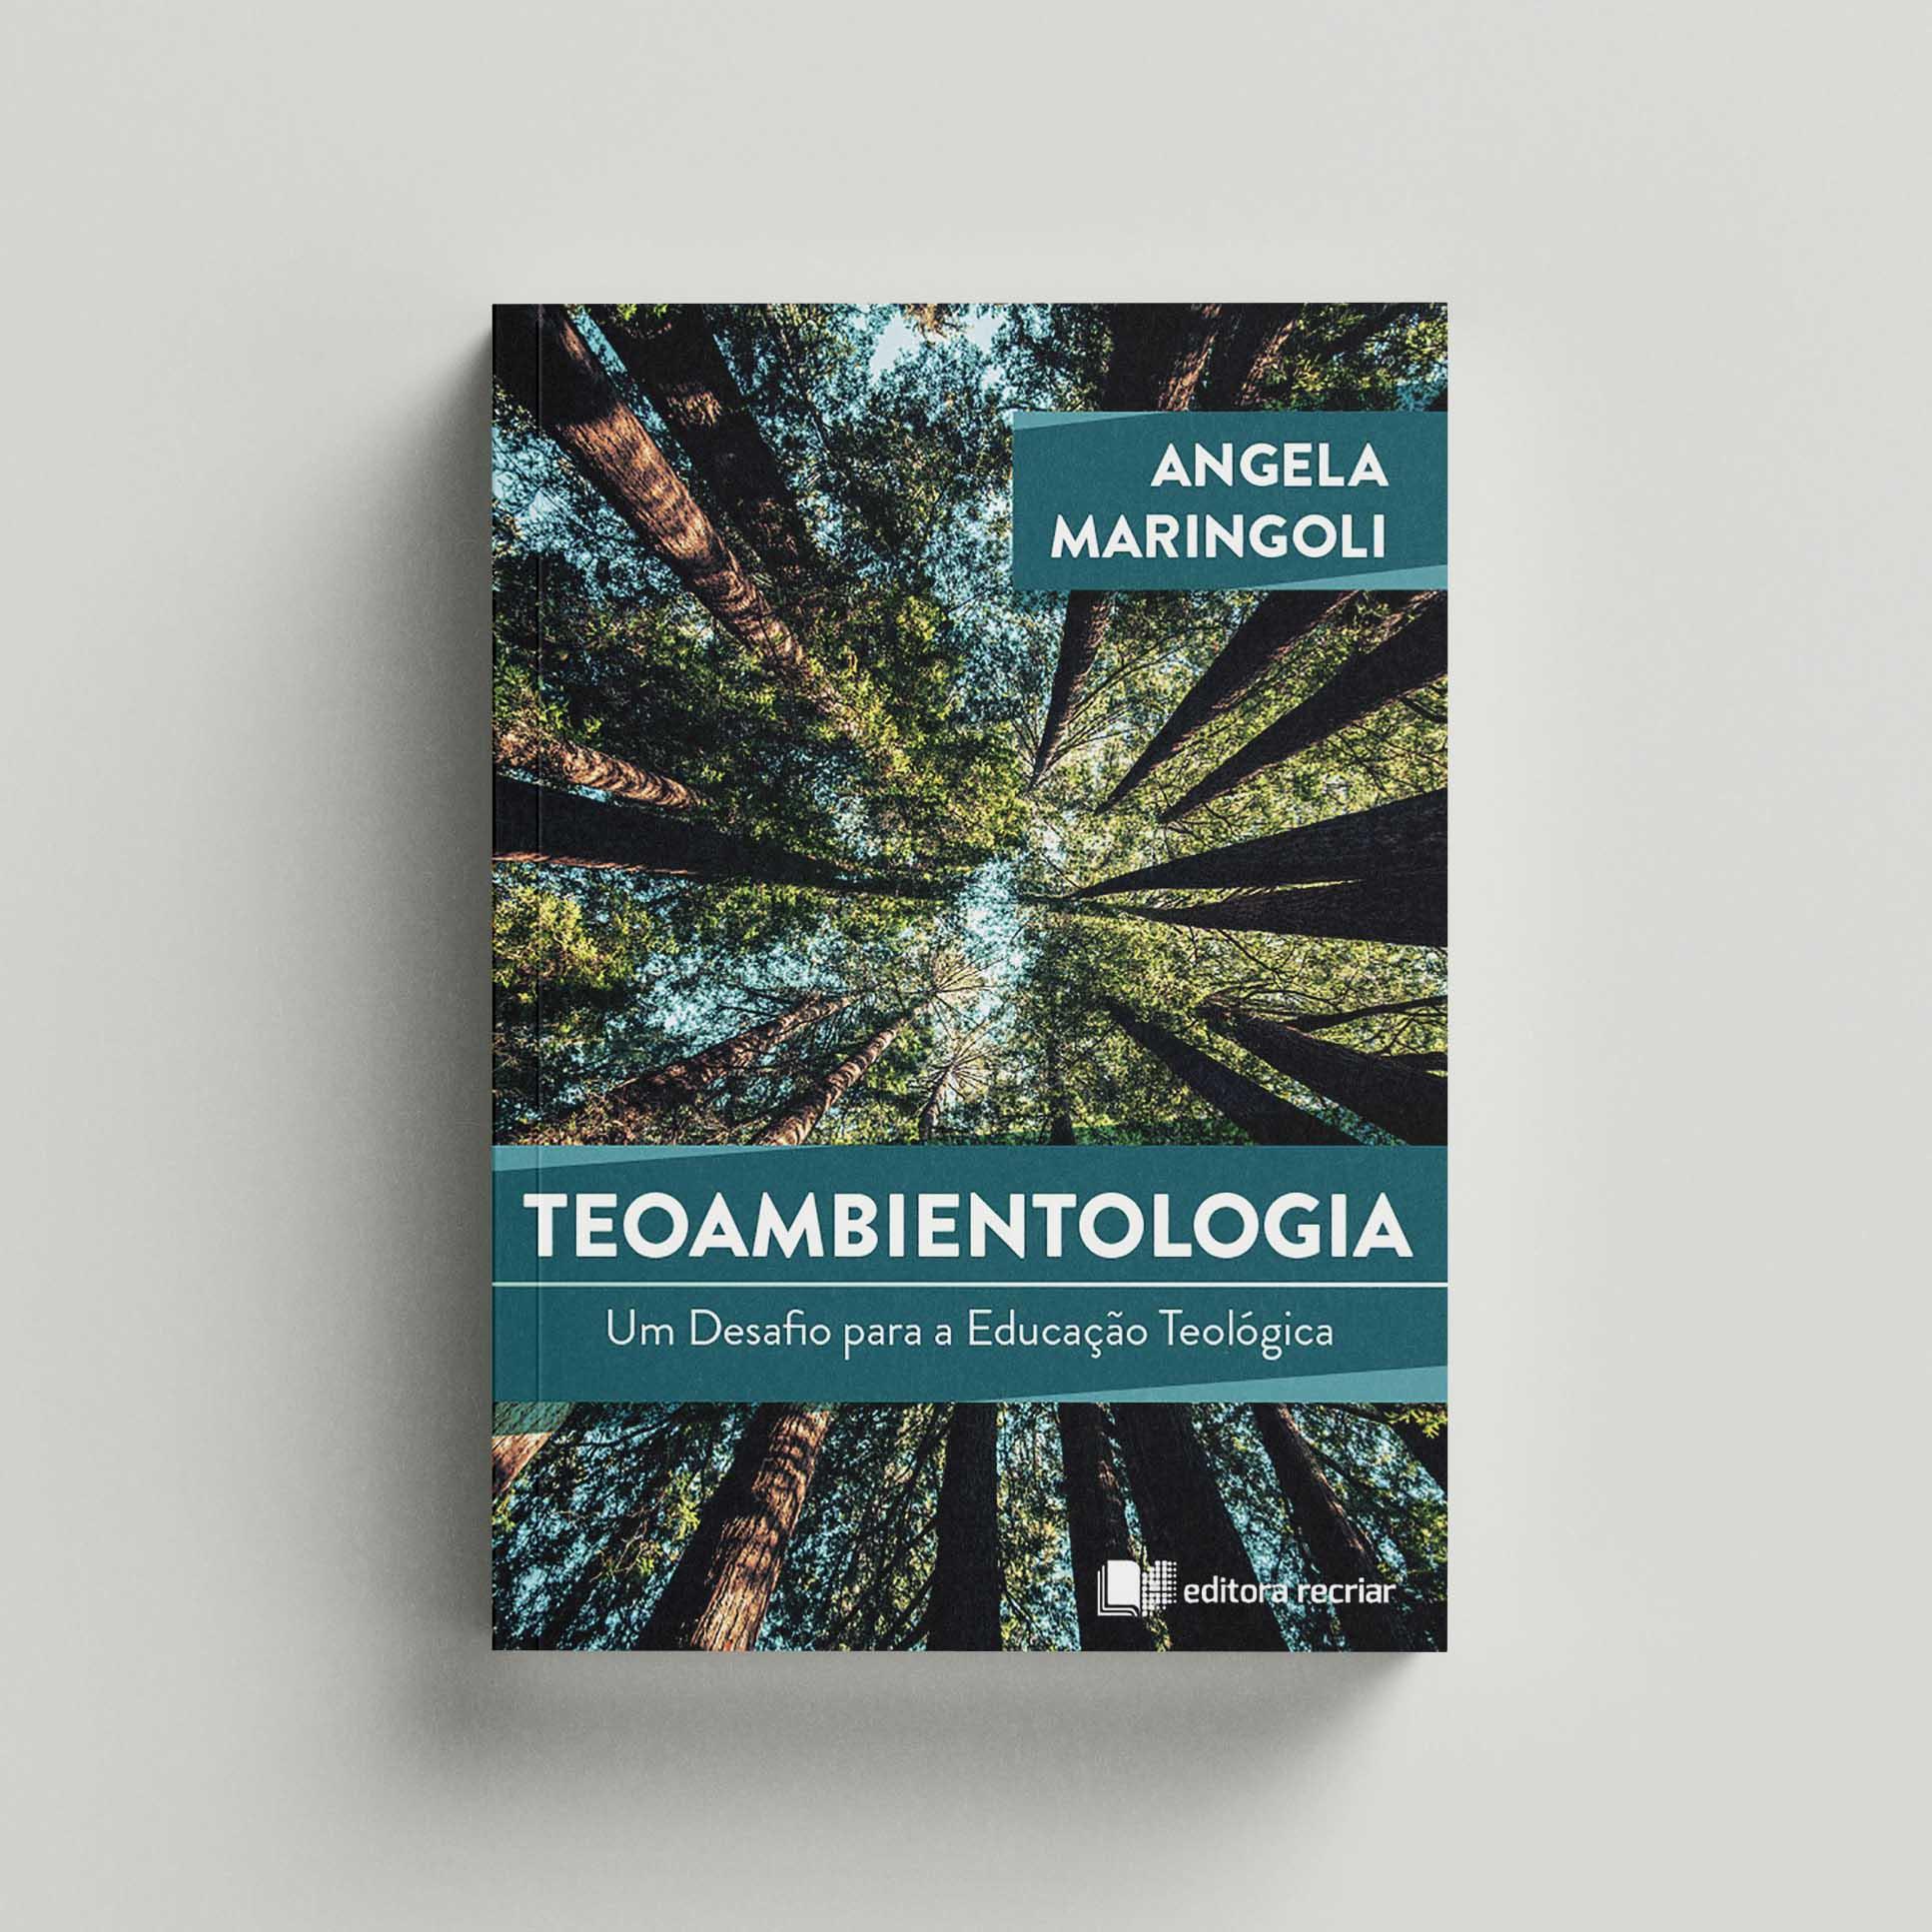 Teoambientologia - Ângela Maringoli